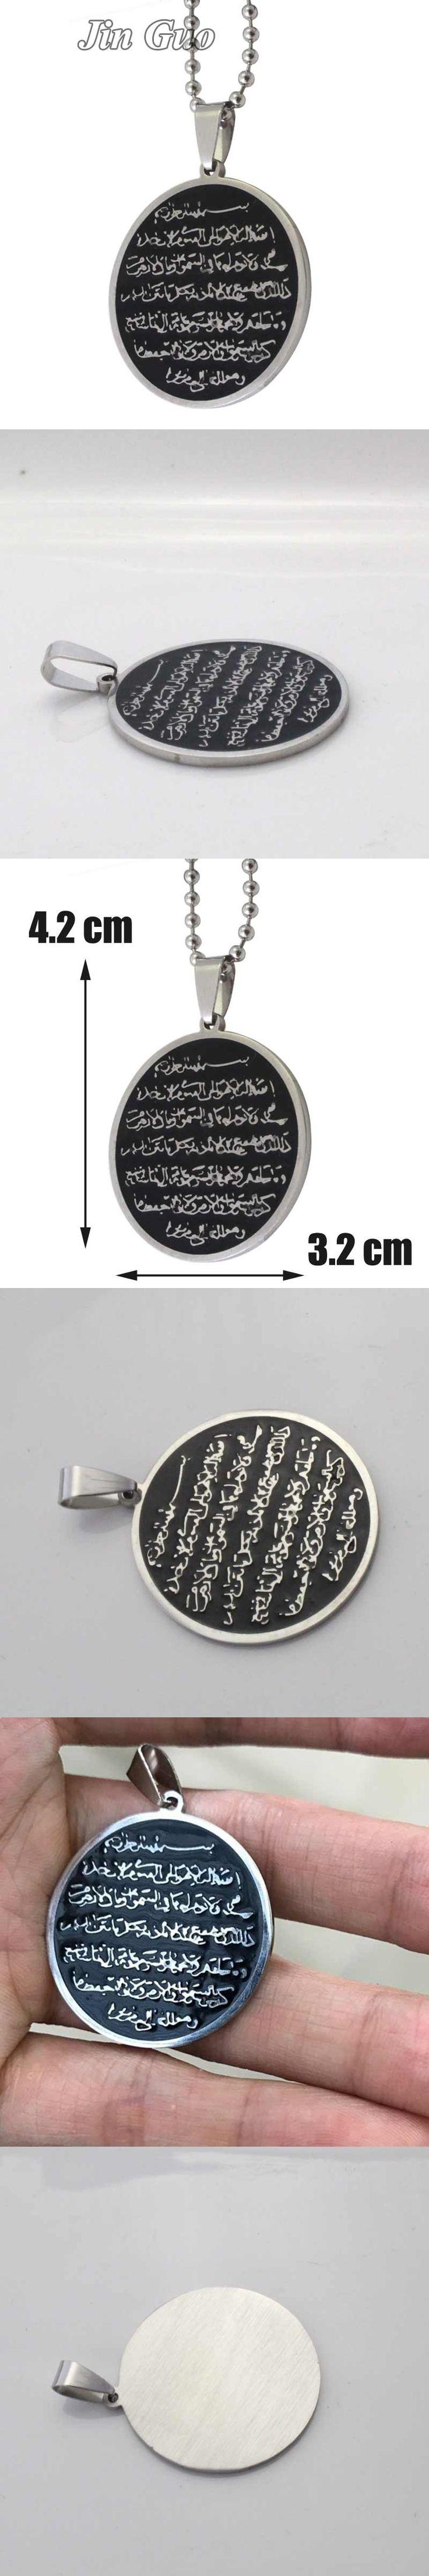 Jin Guo  Turkish islam muslim jewelry Ayatul Kursi stainless steel pendant & necklace